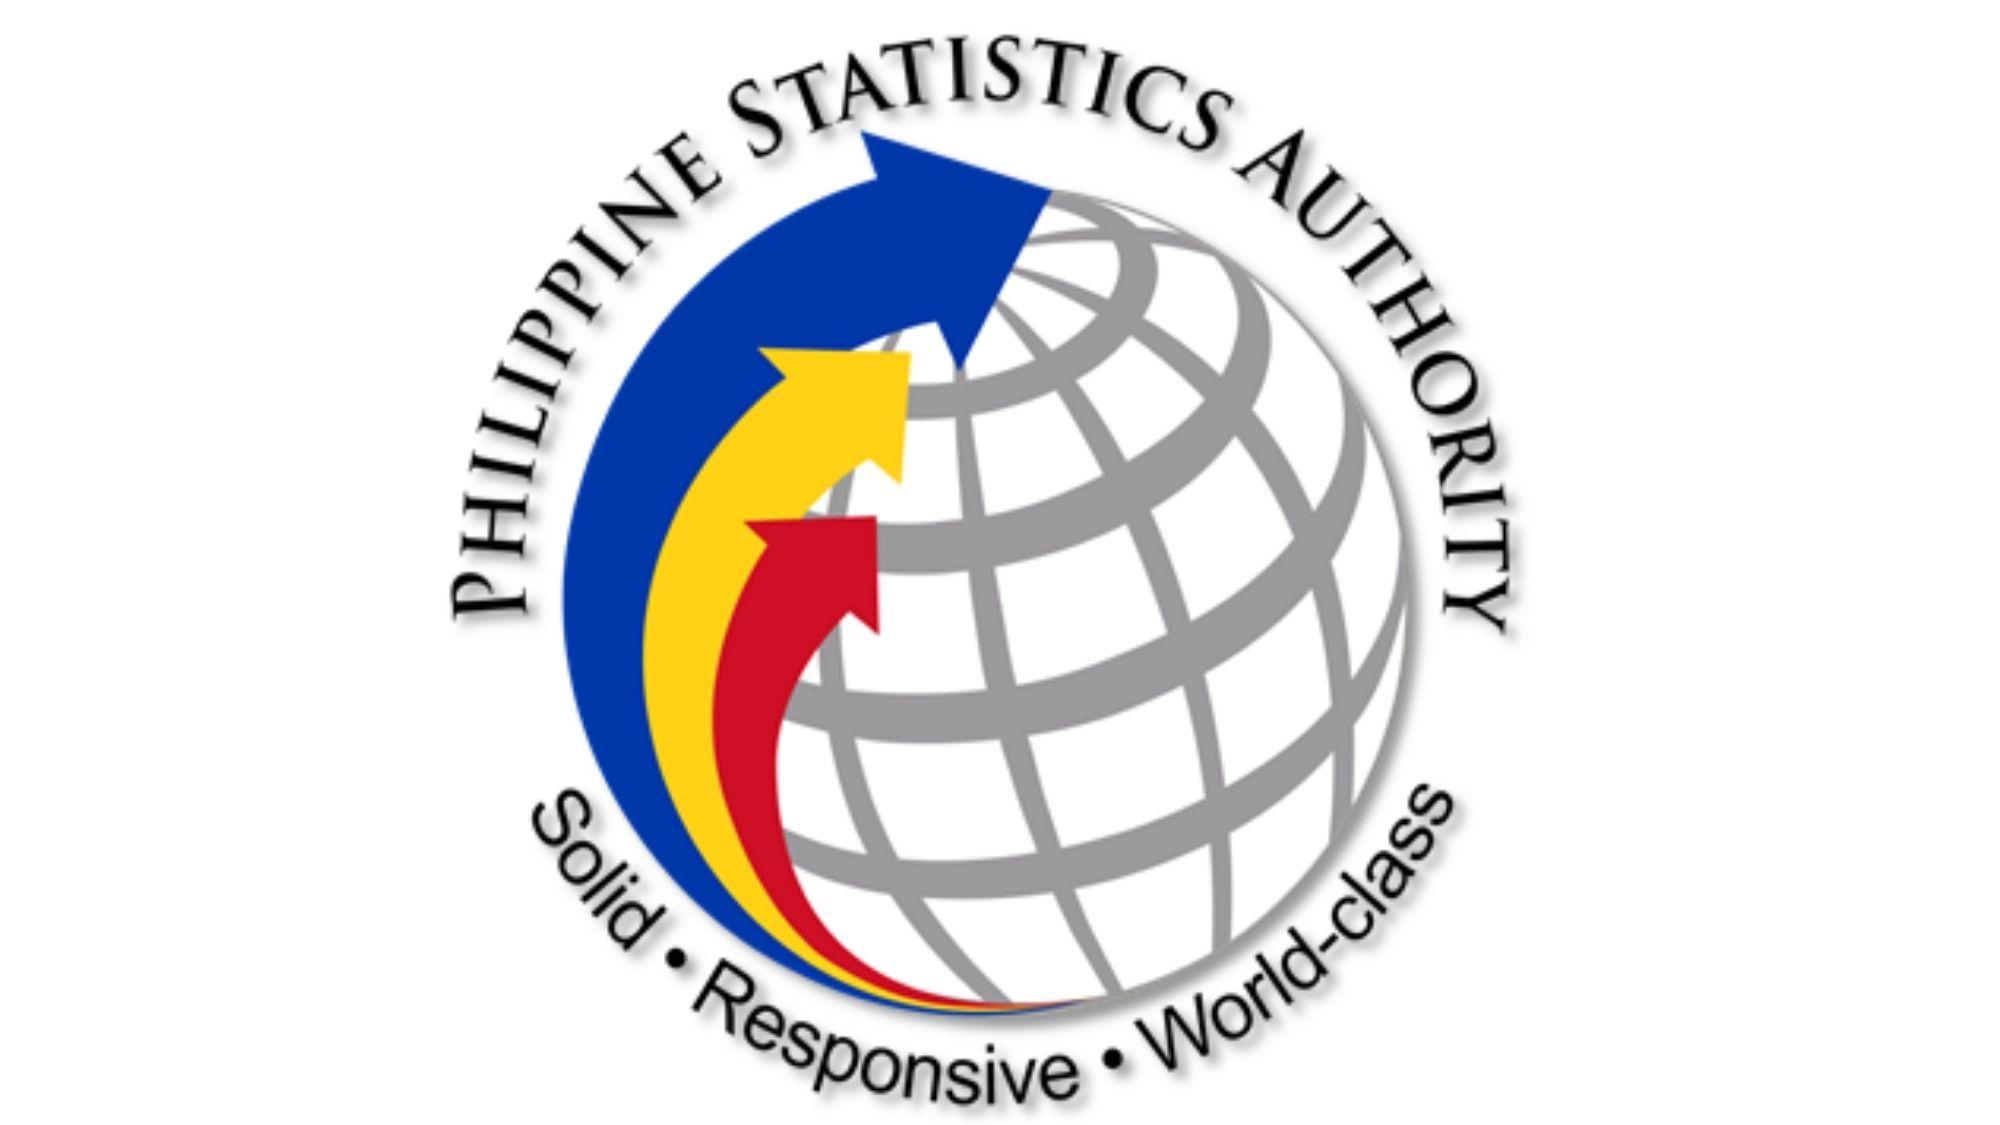 Philippines Statistics Authority